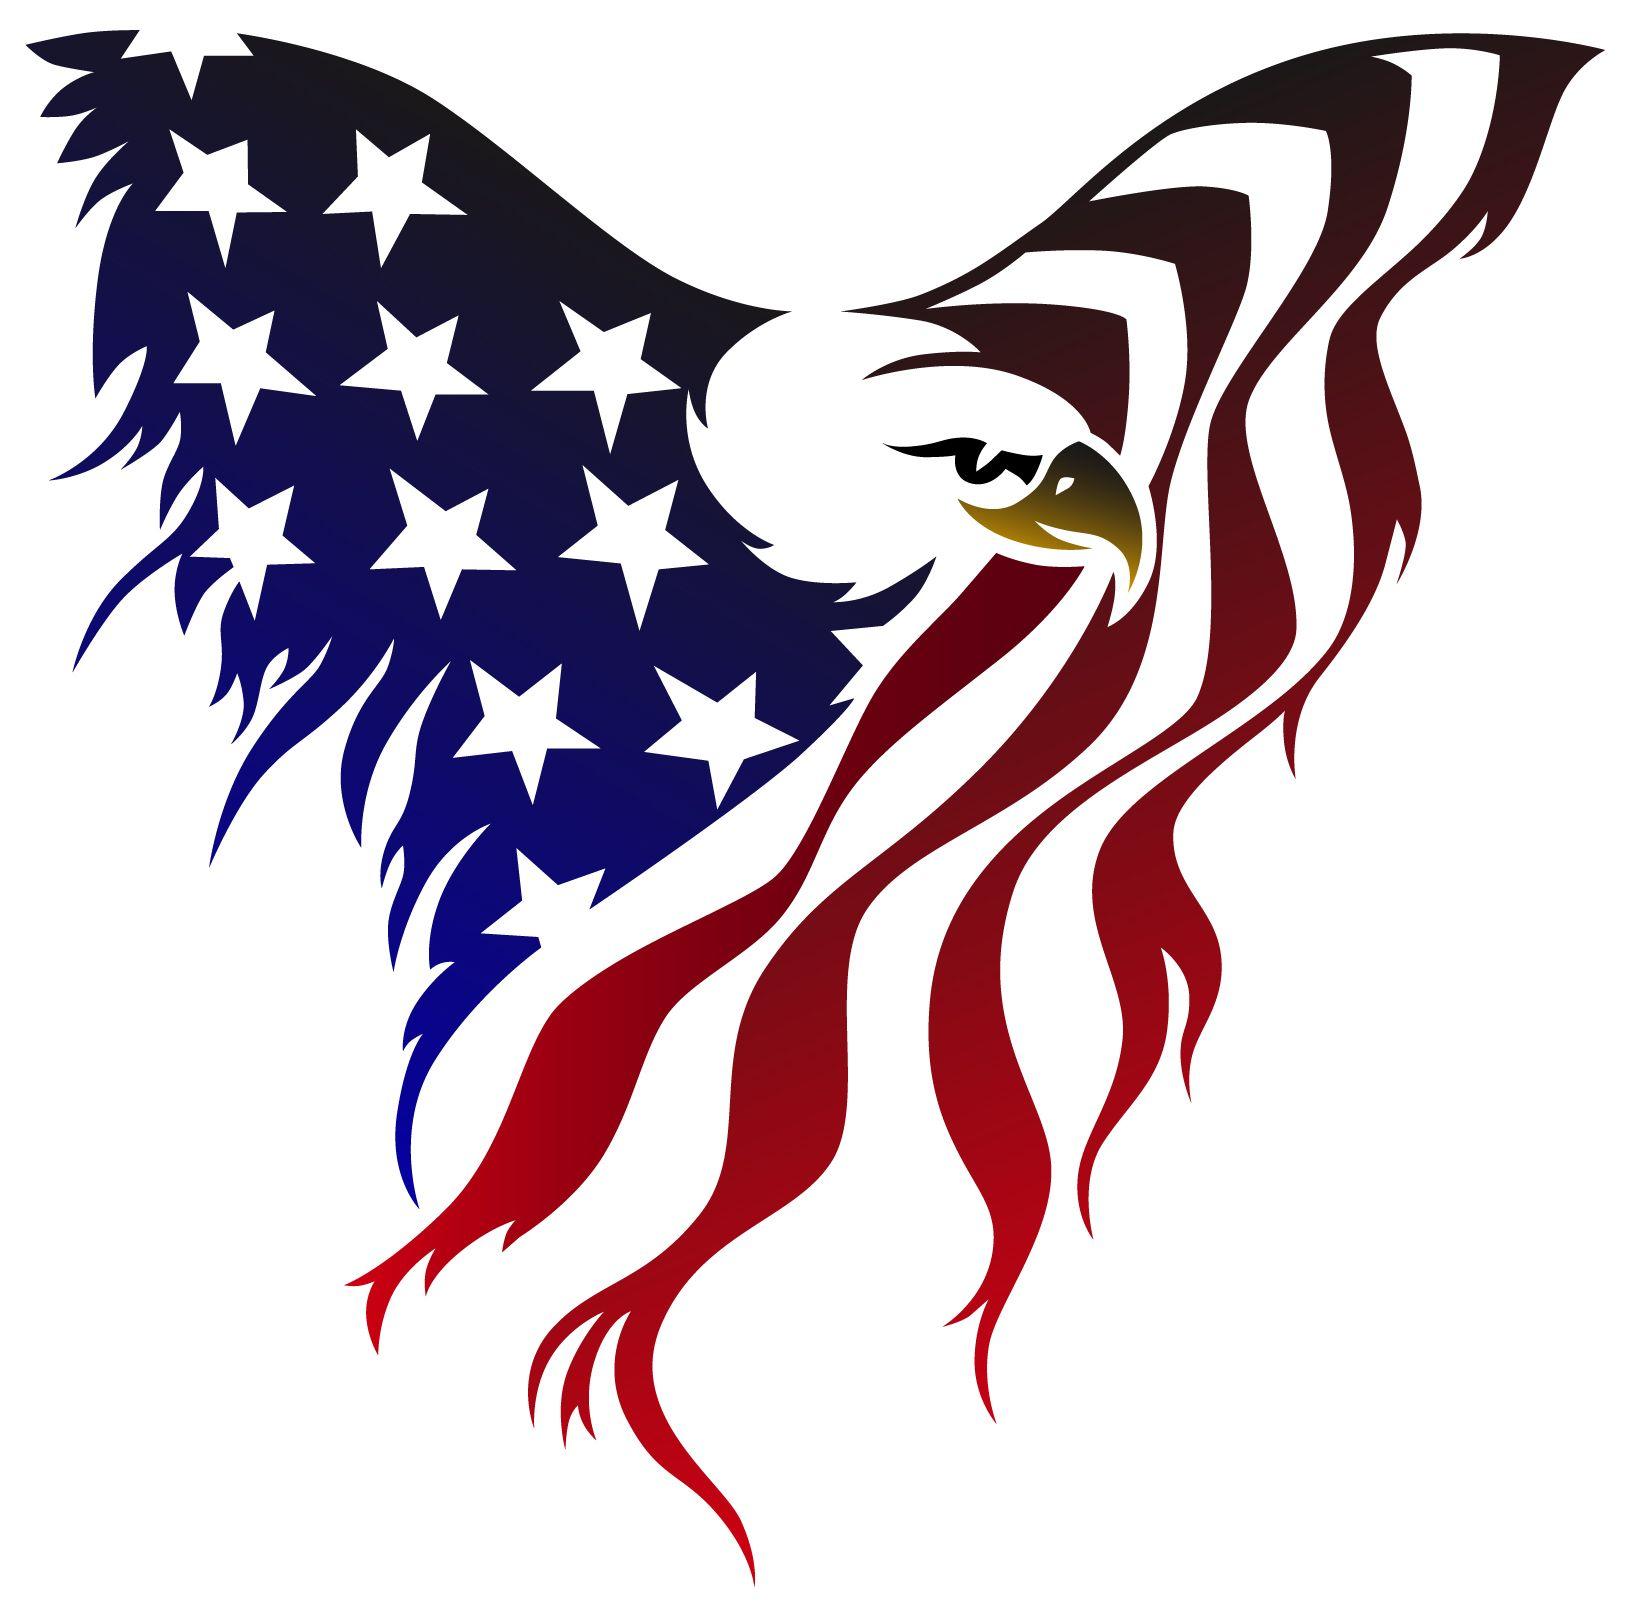 American eagle tattoos high quality photos and flash - American Flag Eagle Tattoo